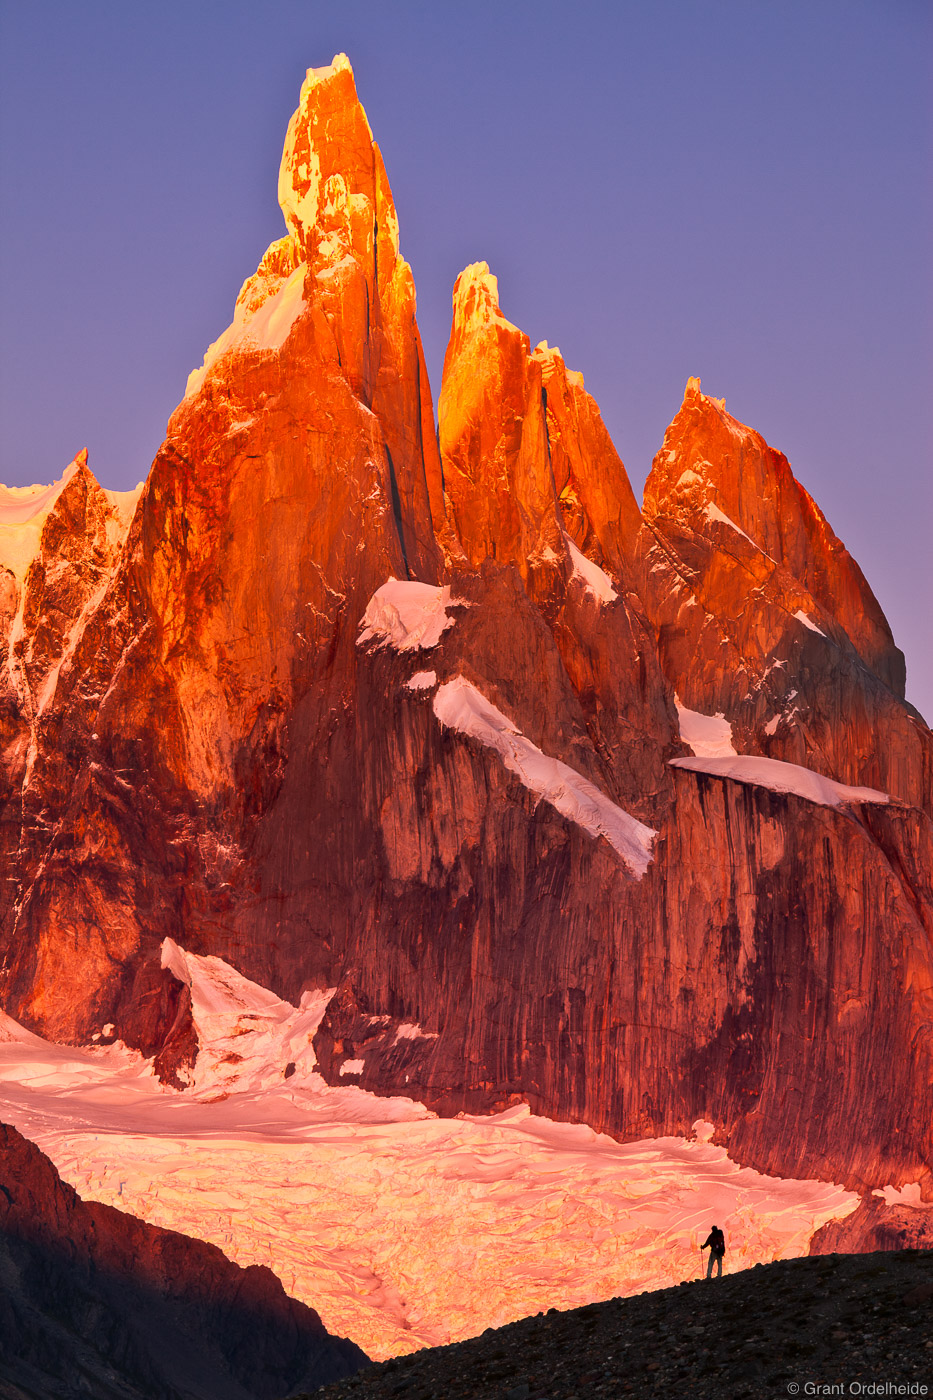 Cerro, torre, scale, El Chaltén, argentina, hiker, watches, sunrise, massive, peaks, egger, standhardt, photo